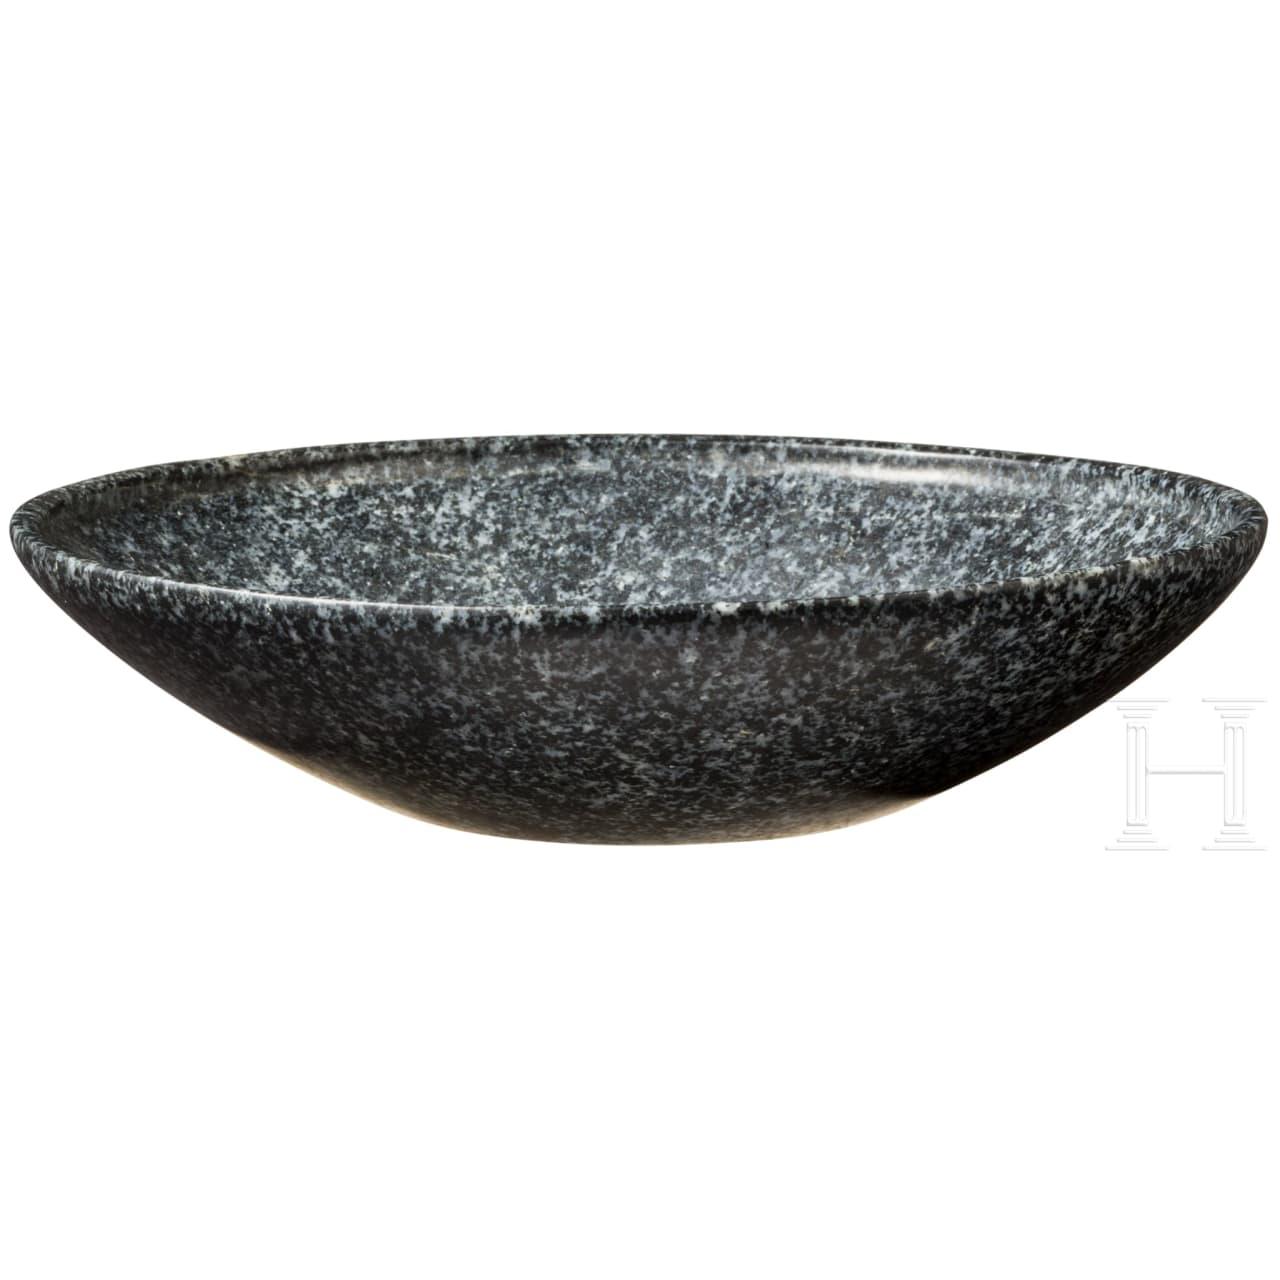 An ancient Egyptian diorite bowl, 1st – 3rd dynasty, circa 2920 – 2575 B.C.